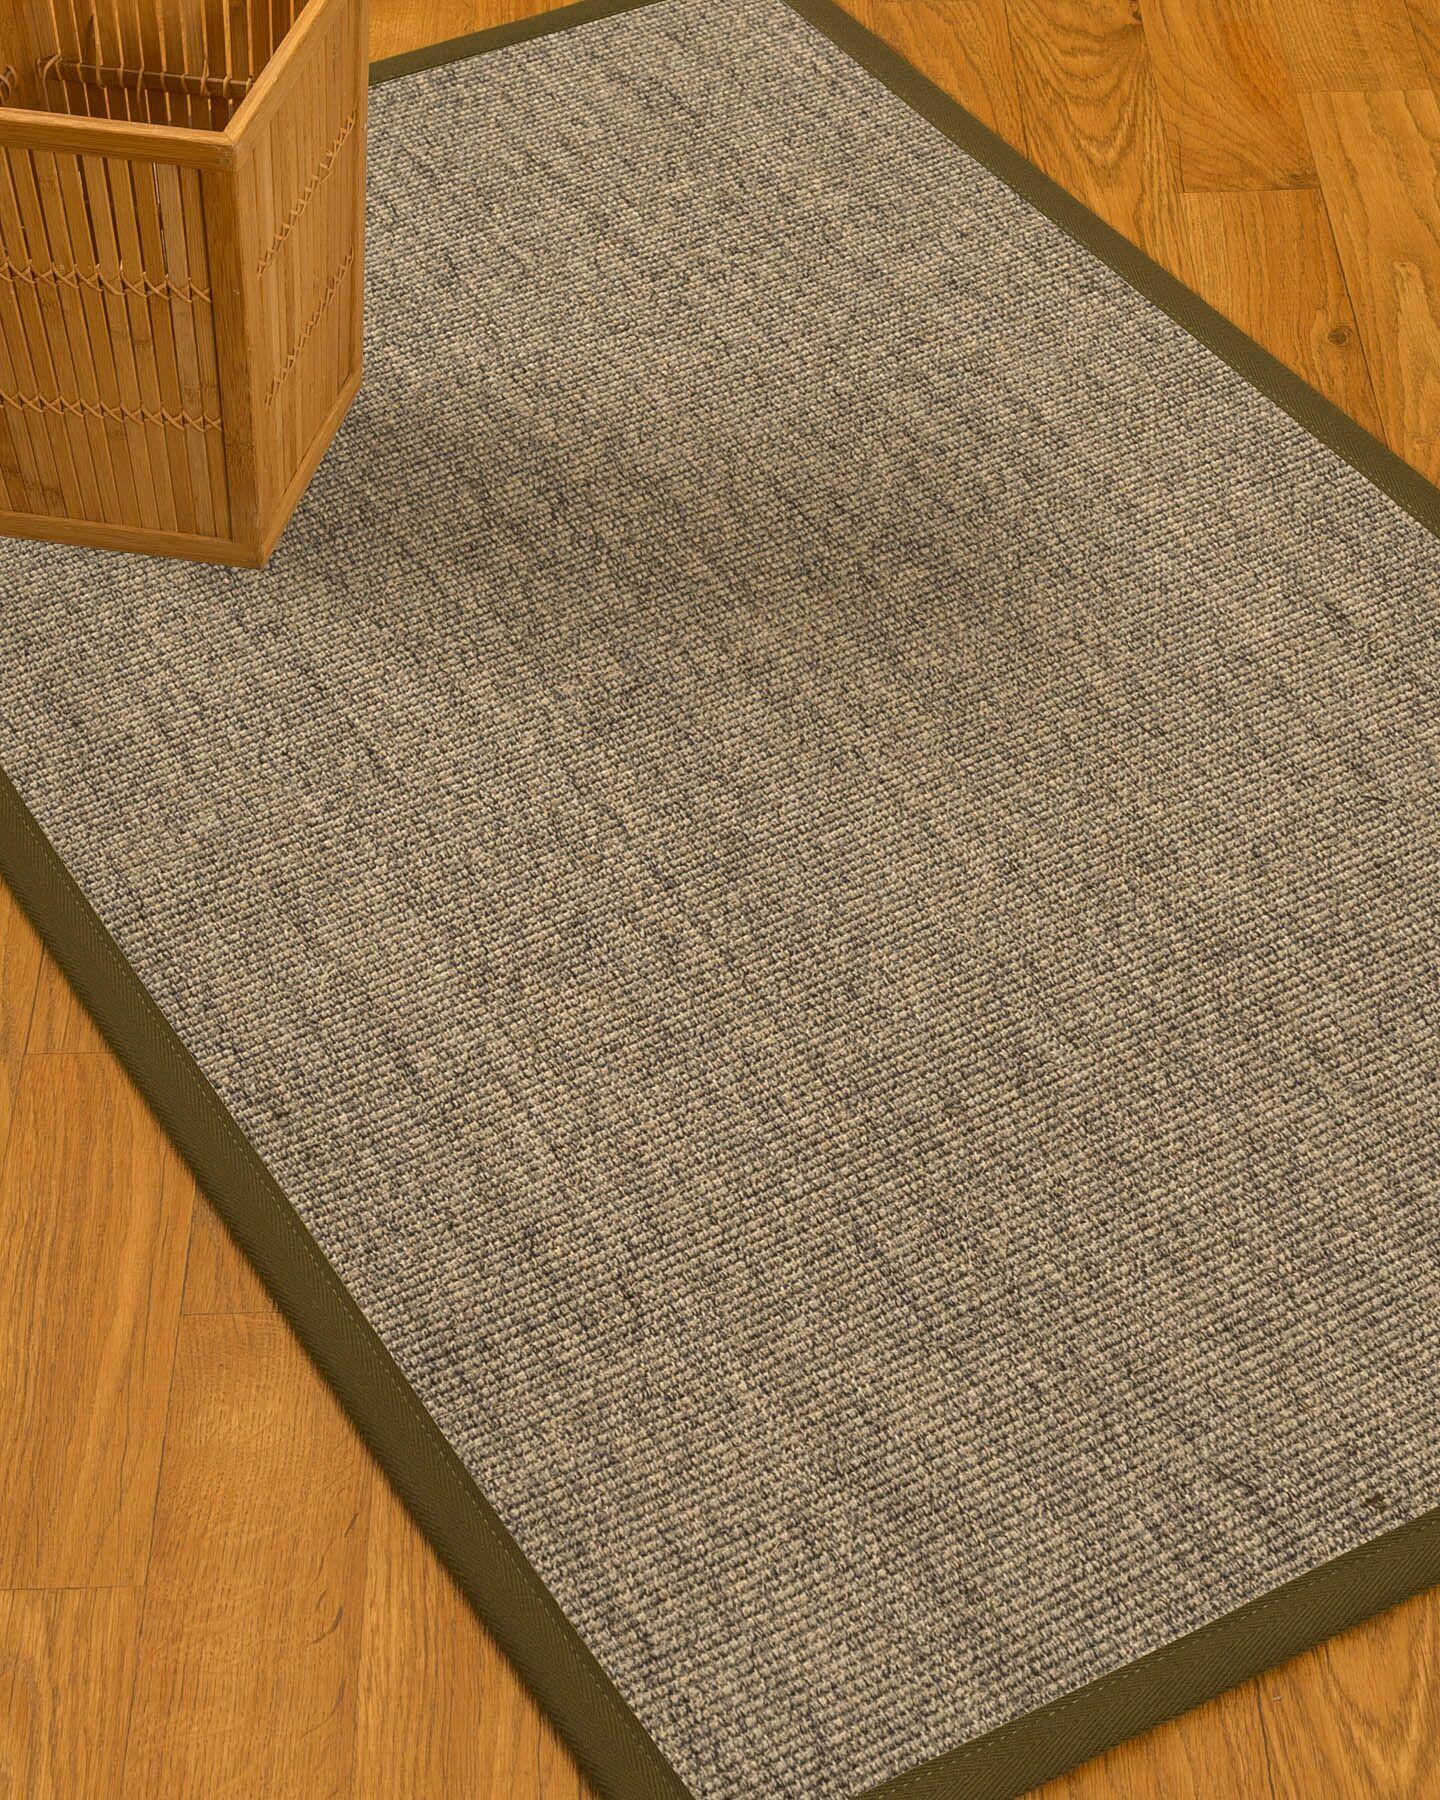 Mahan Border Hand-Woven Gray Area Rug Rug Size: Rectangle 8' x 10', Rug Pad Included: Yes